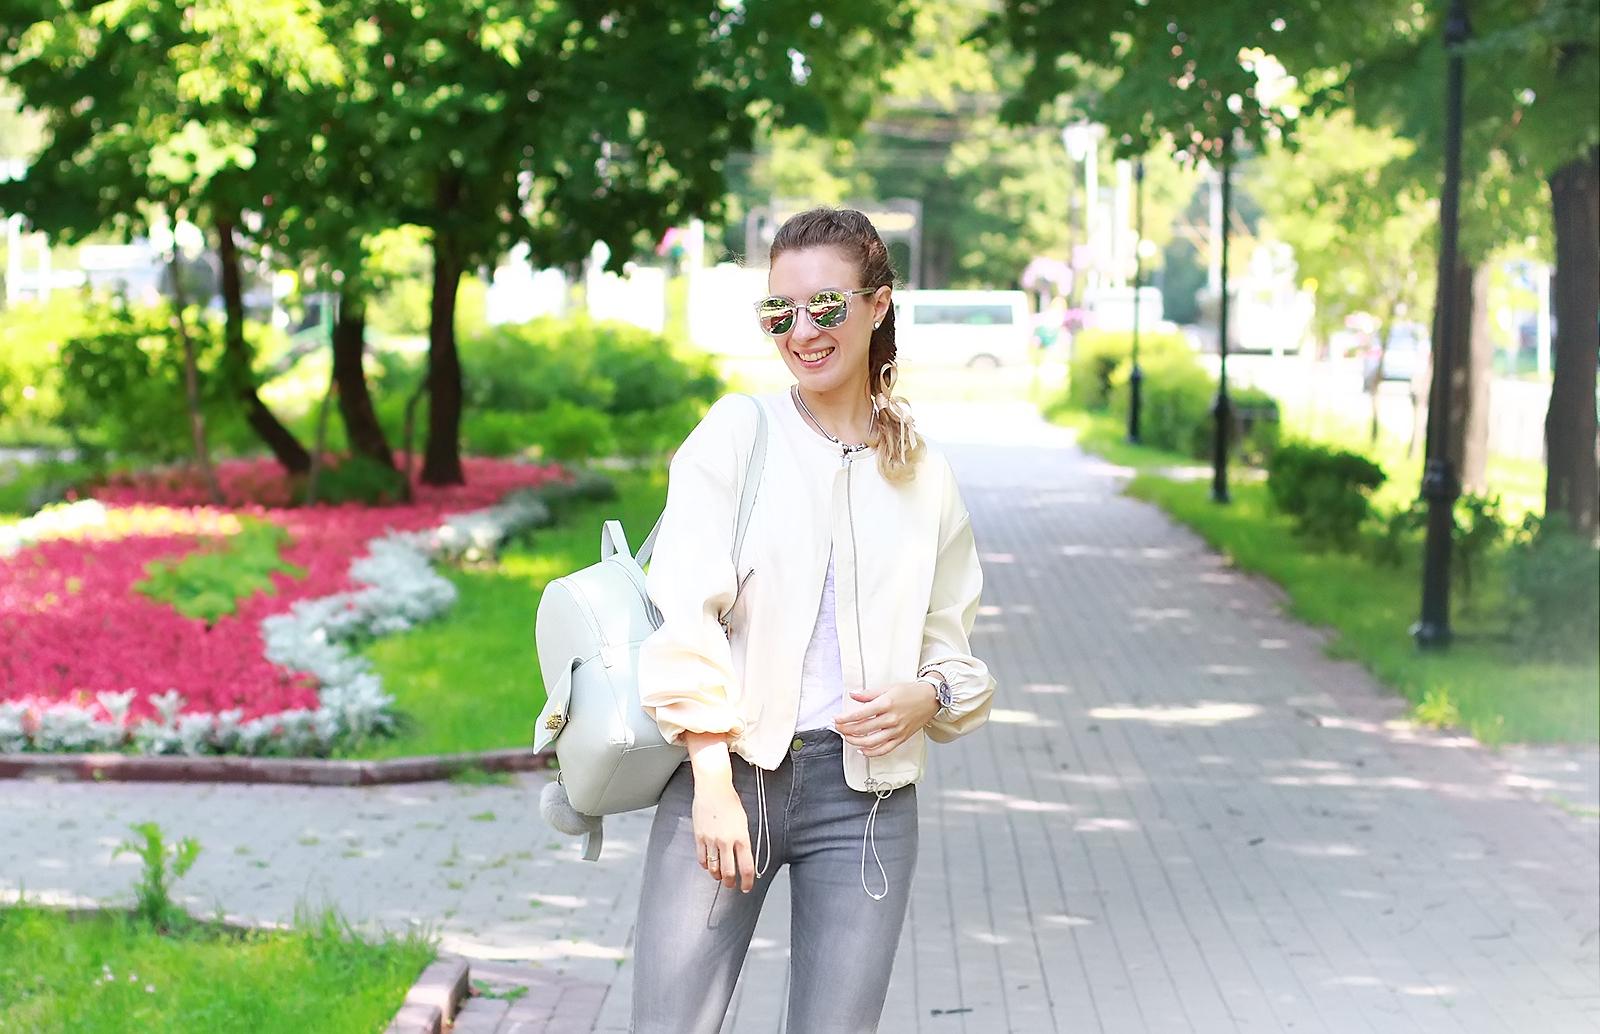 margarita_maslova_ritalifestyle_pastel_sport_look_backpack_streetlook